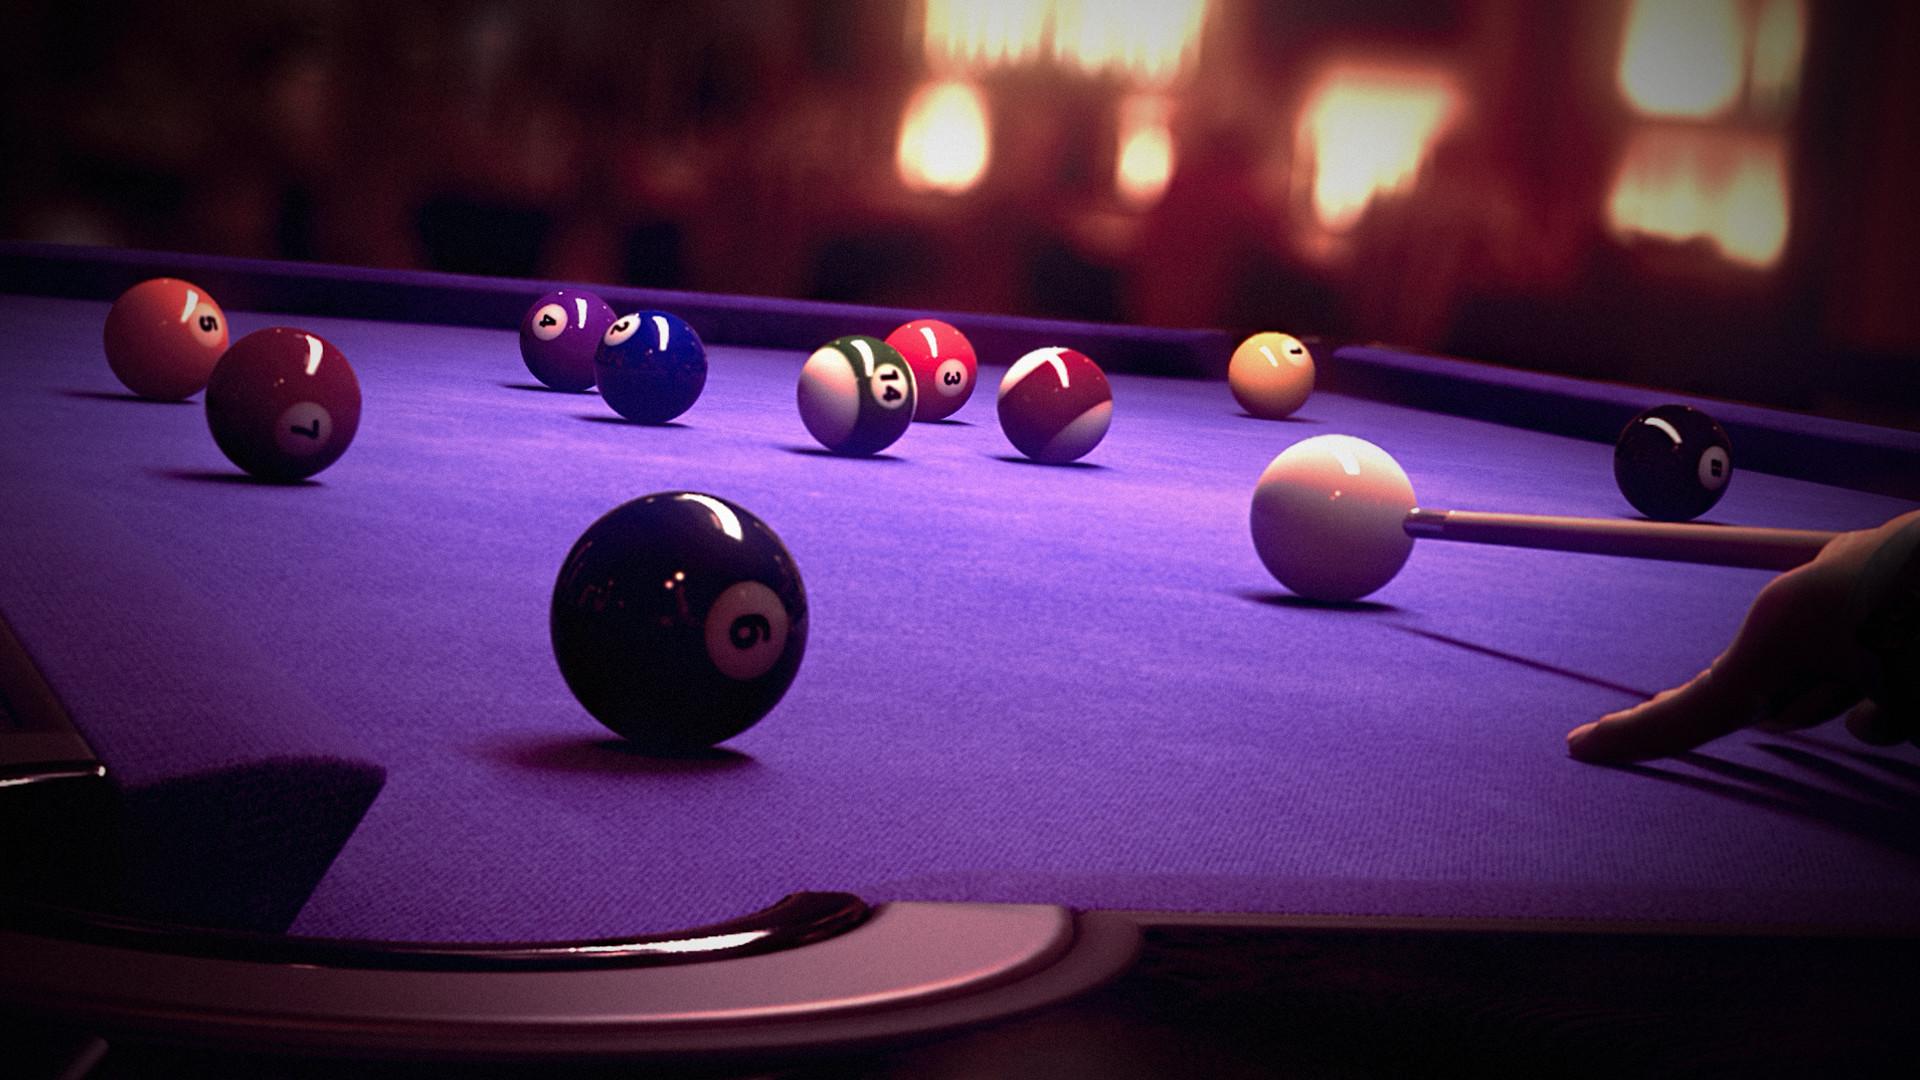 Pool Table Artwork , HD Wallpaper & Backgrounds